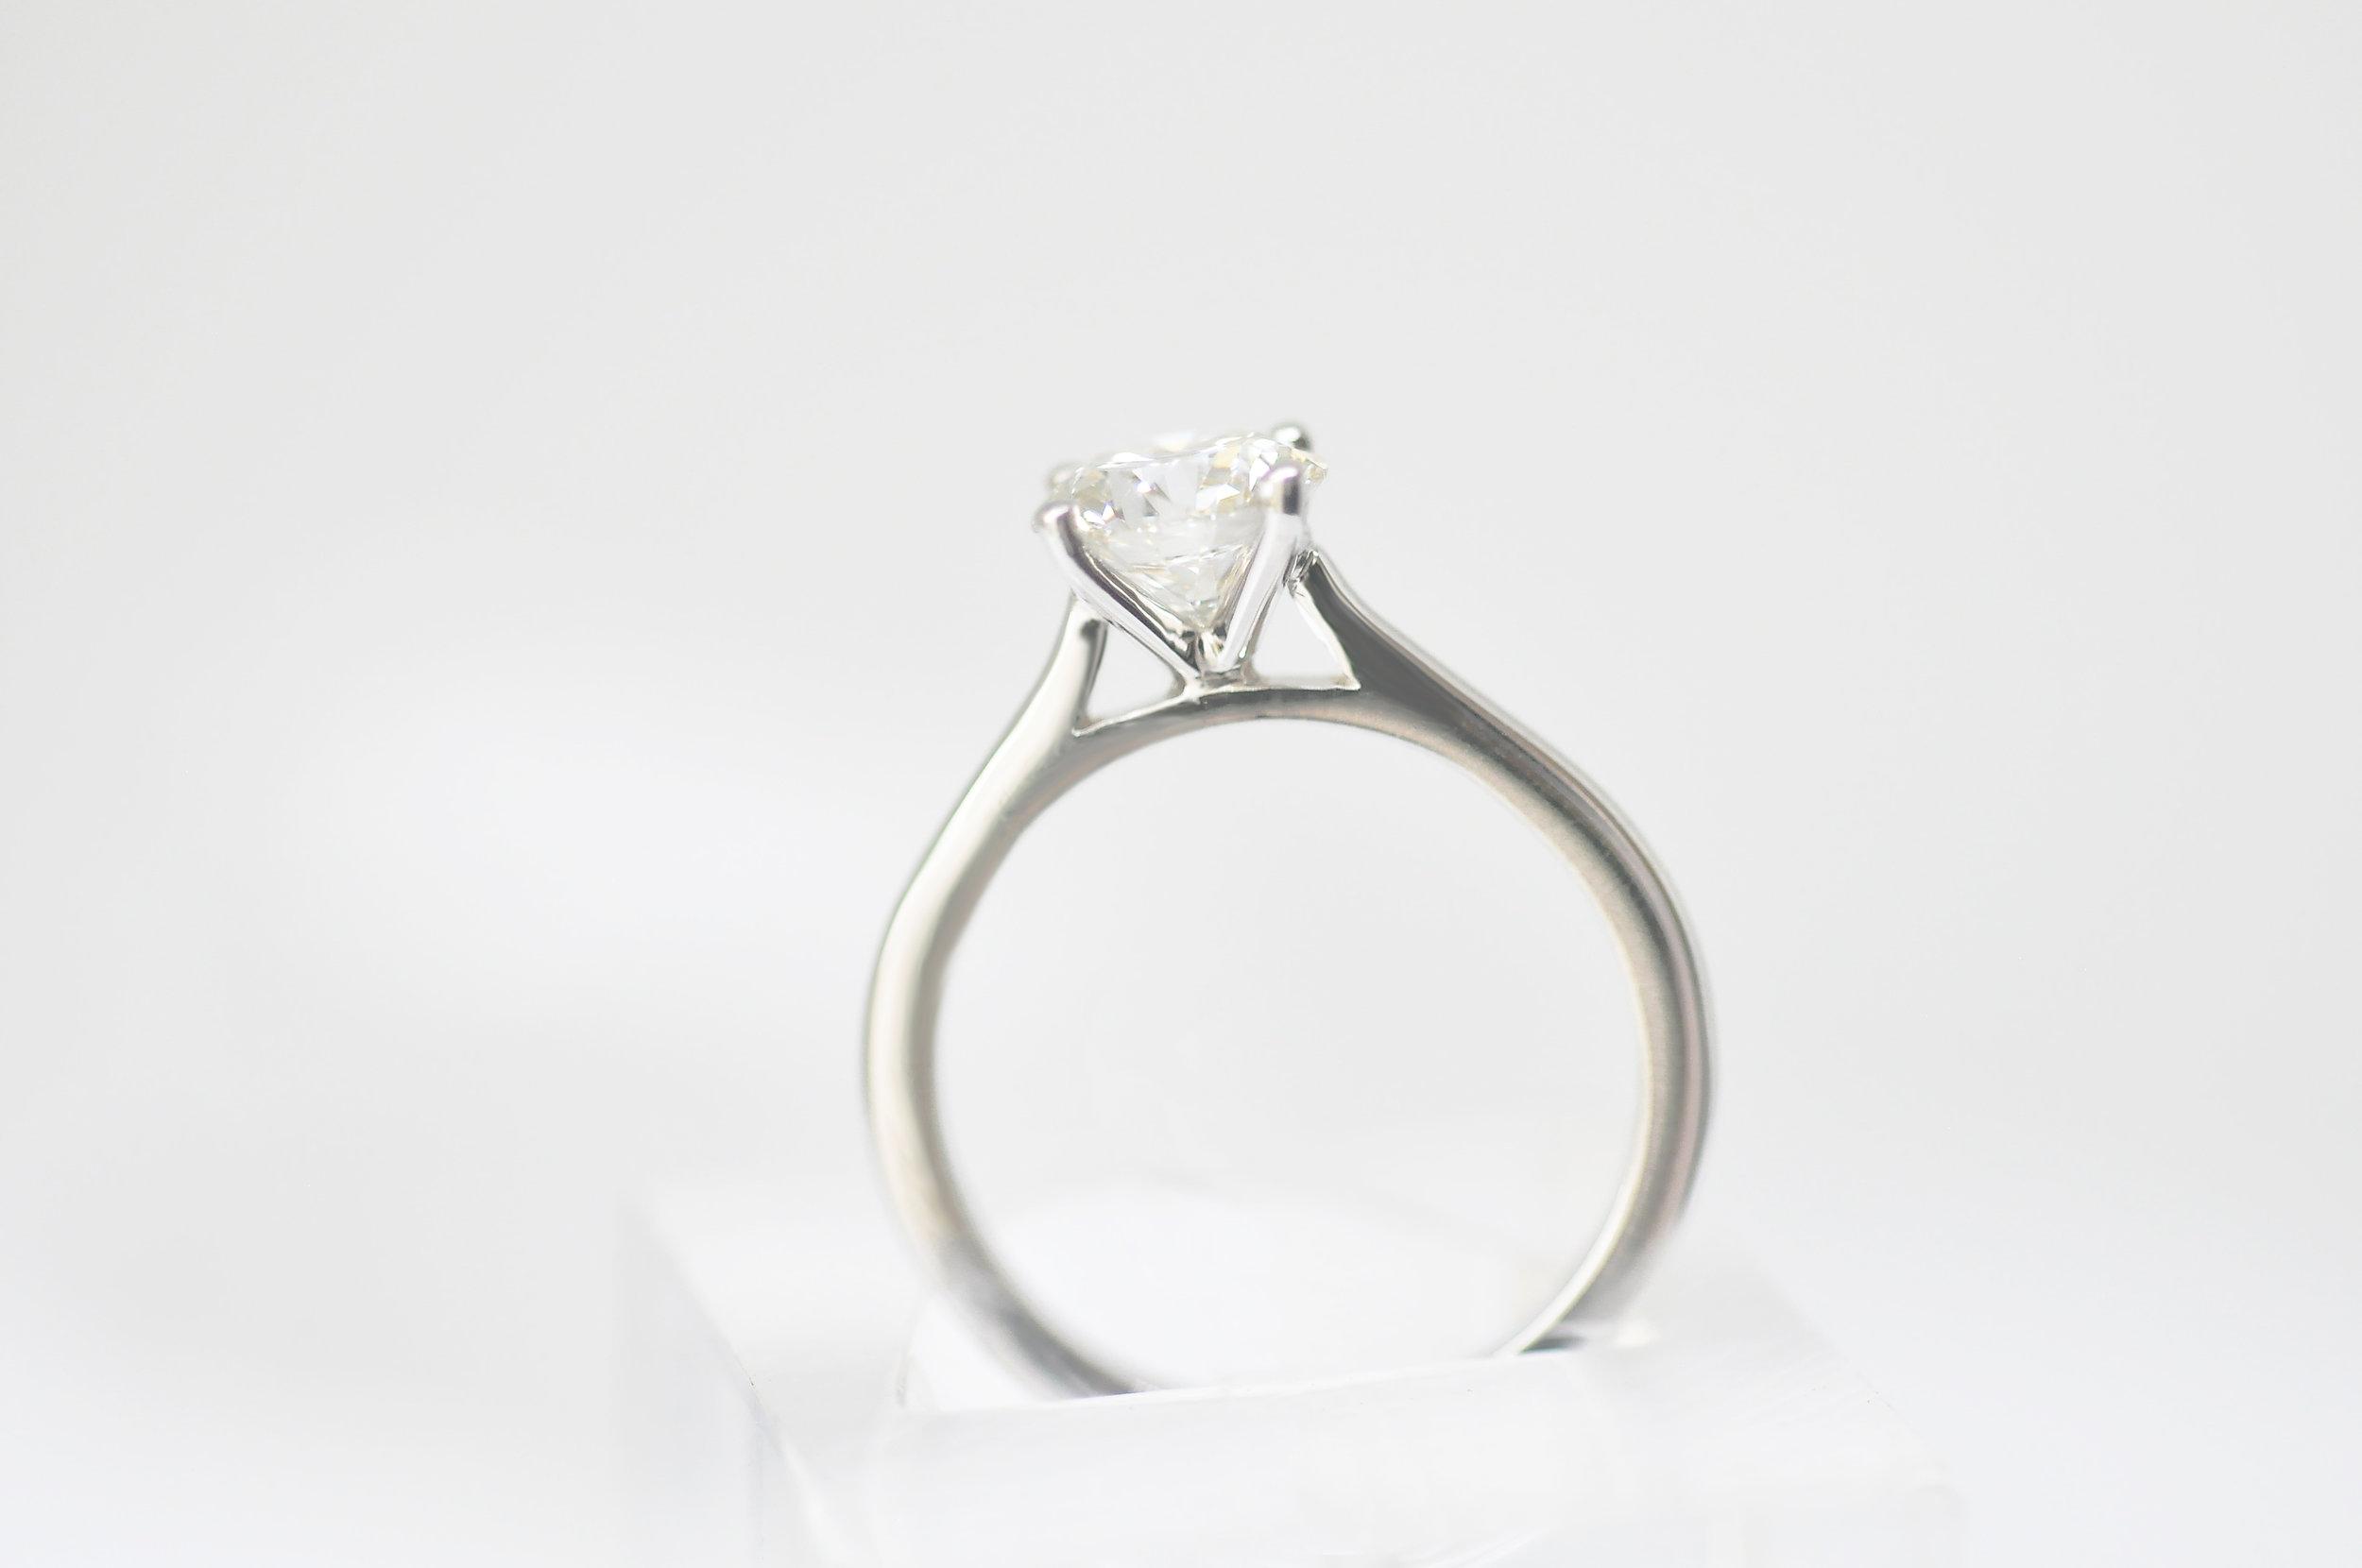 Solitaire Diamond Engagement Ring Toronto.jpg